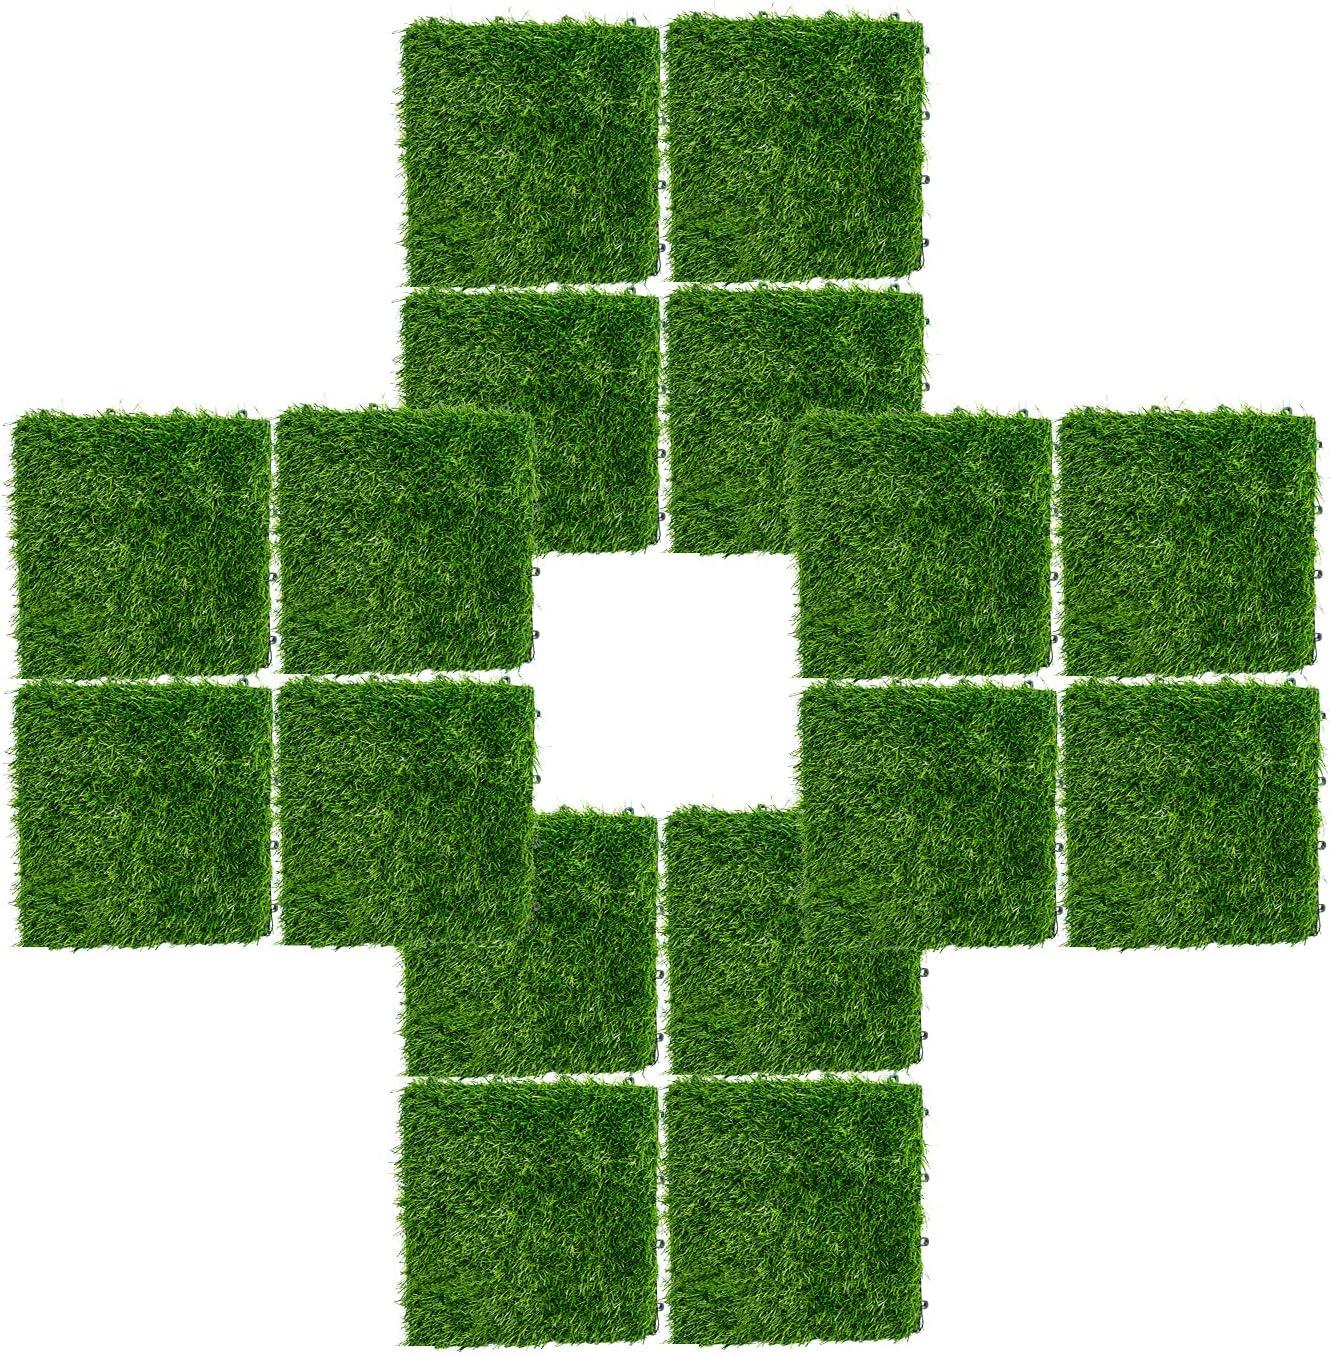 INNOVSIGN Artificial Grass Turf Interlocking 新色追加 Tile Self-draining セール特価品